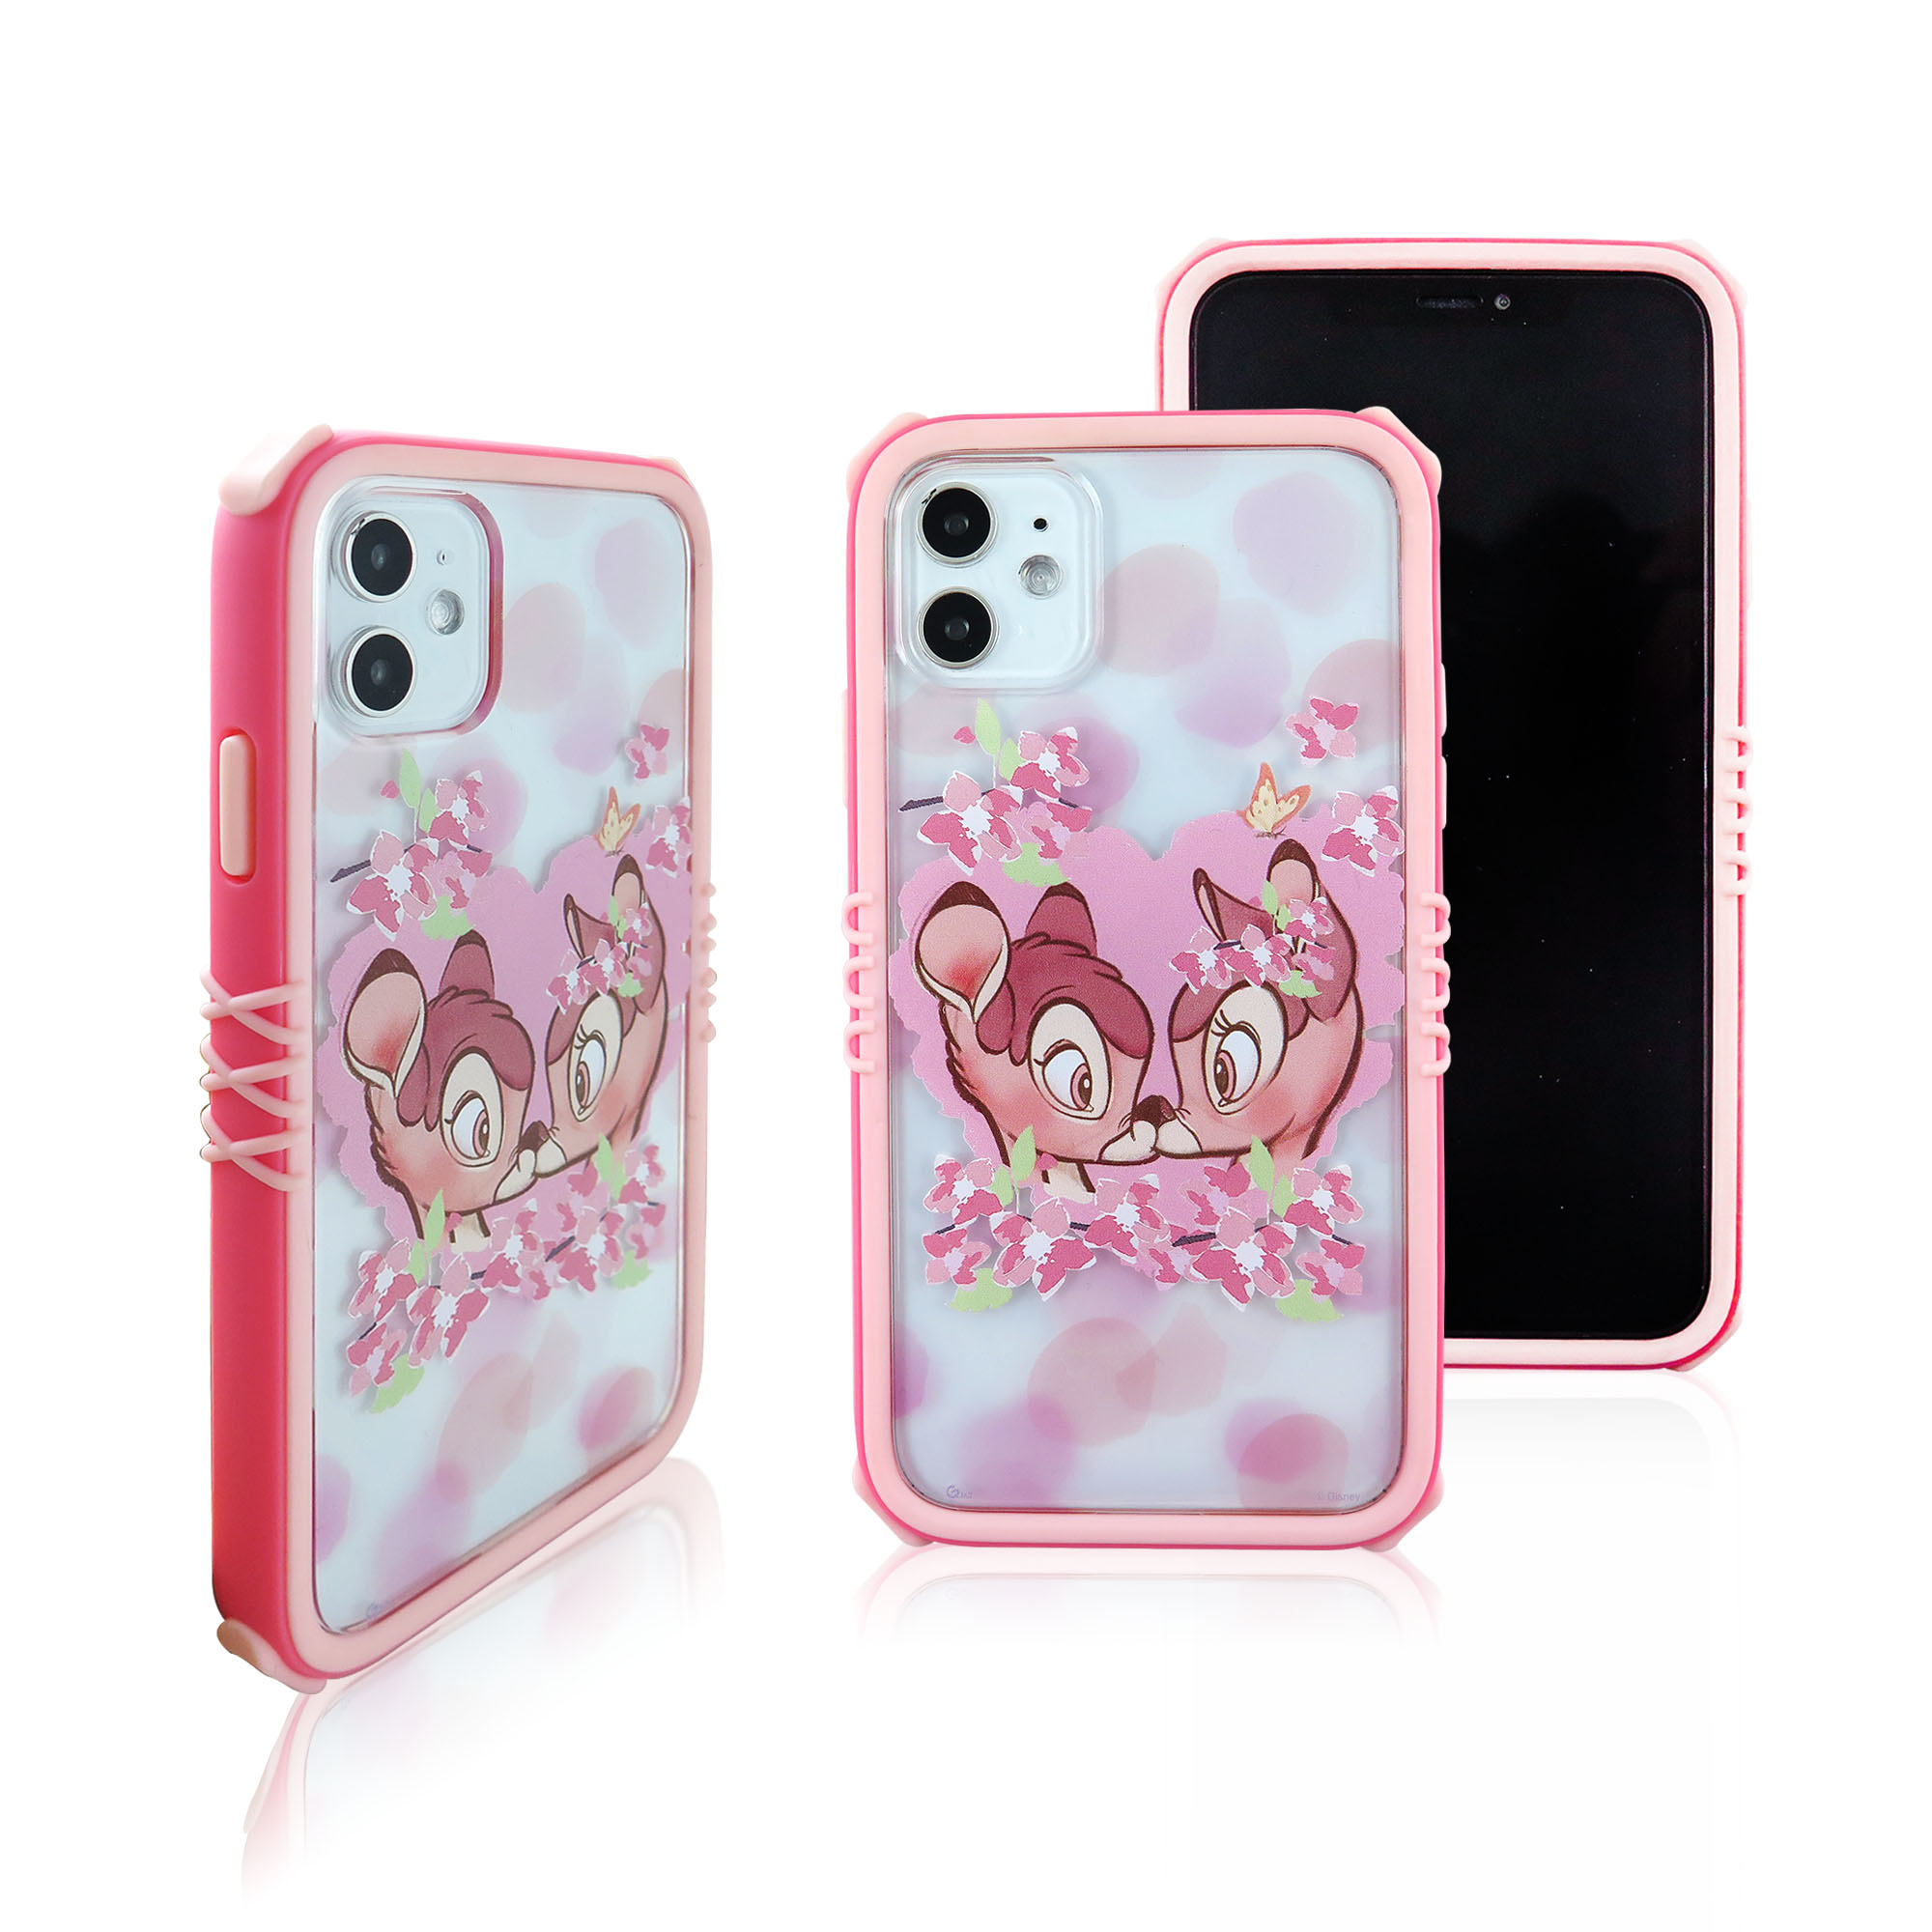 Disney迪士尼iPhone11Pro櫻花系列雅典娜防摔殼_櫻花小鹿斑比